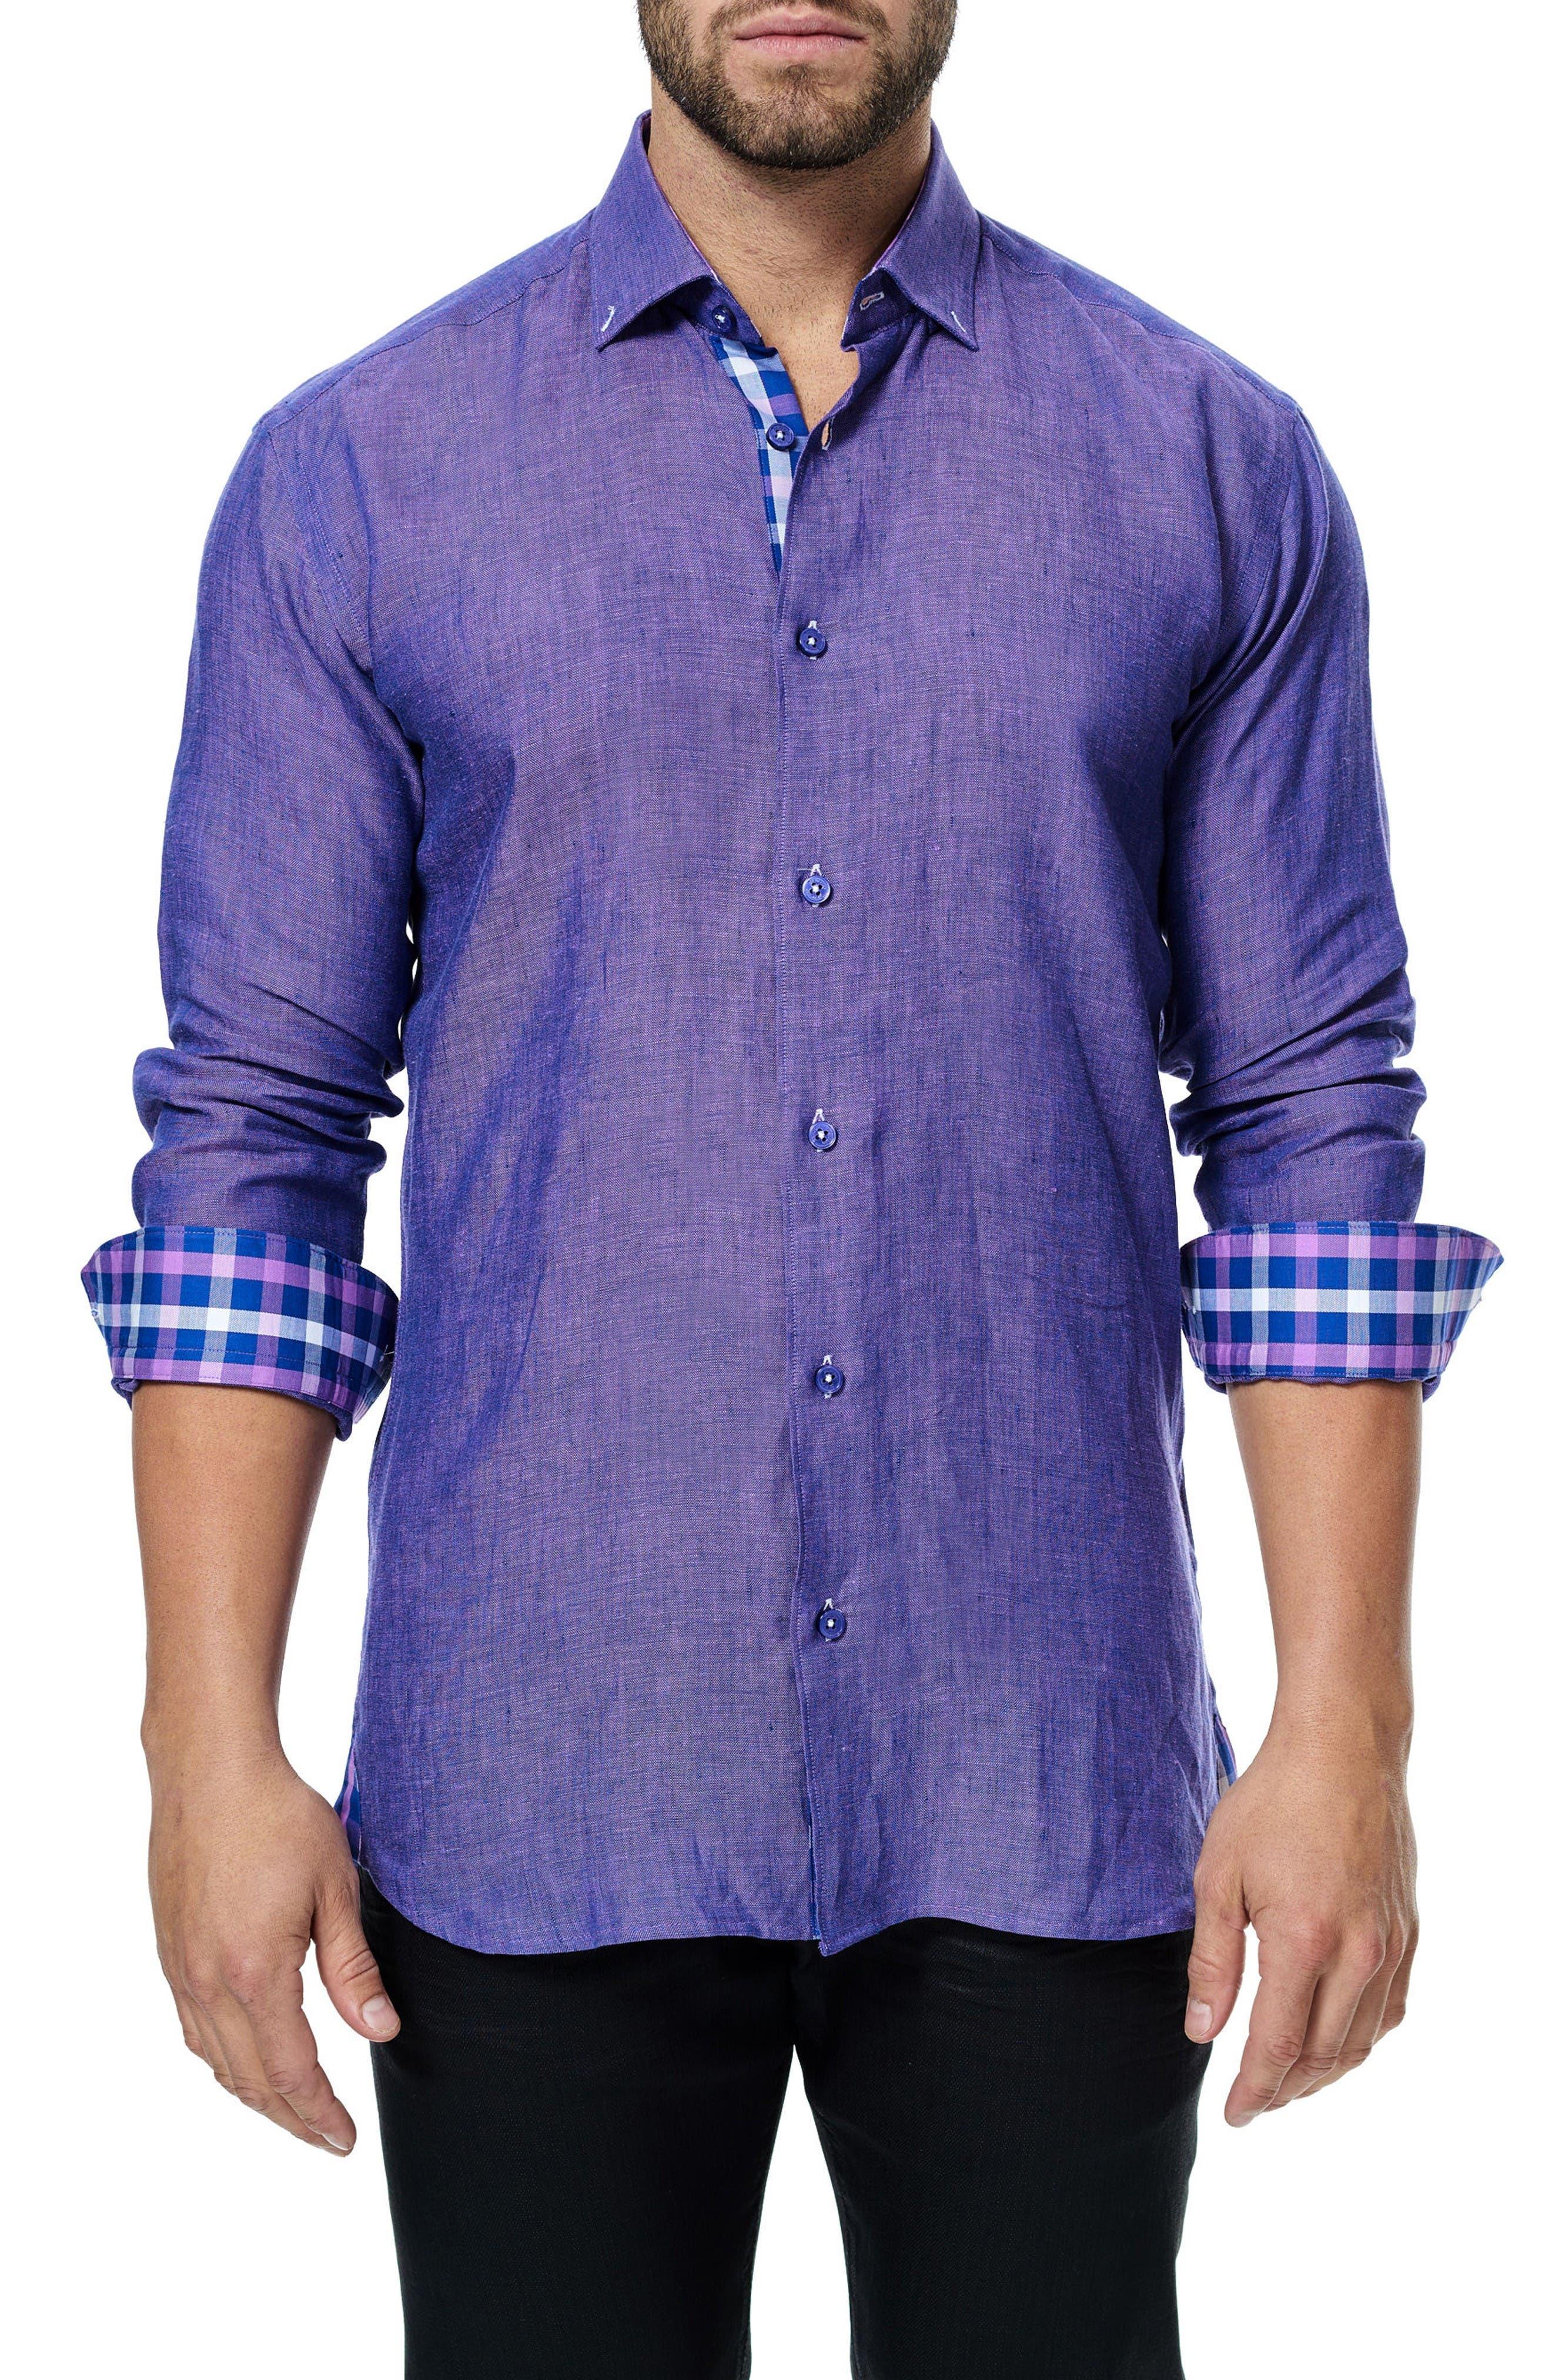 Alternate Image 1 Selected - Maceoo Vogue Linen Sport Shirt